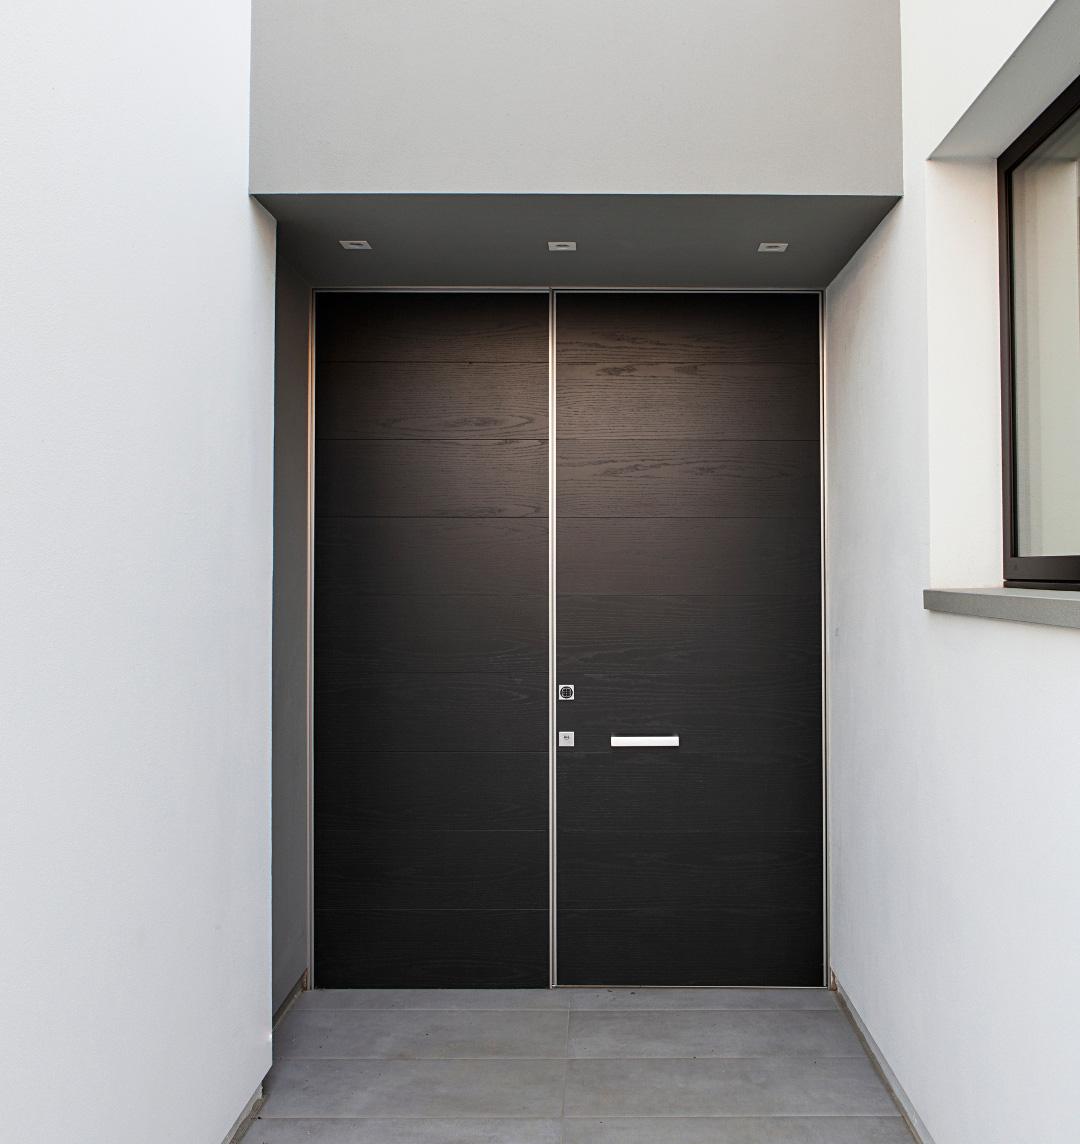 puerta blindada doble hoja synua wallsystem de Oikos